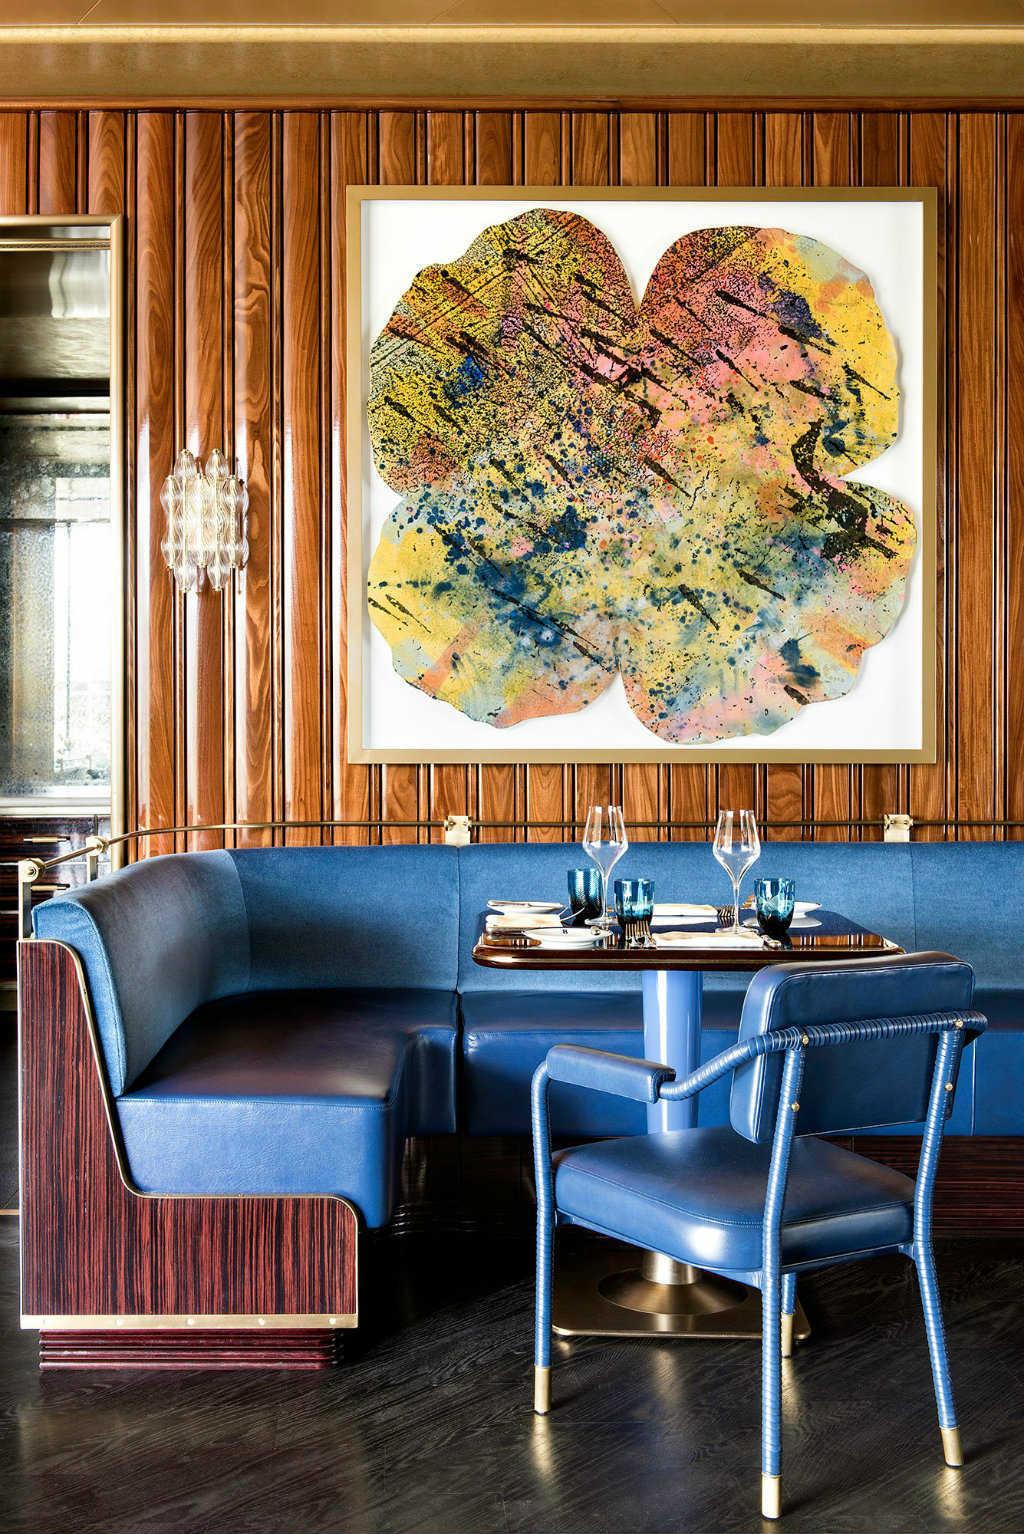 Kitchen furniture ideas from Martin Brudnizki restaurants projects